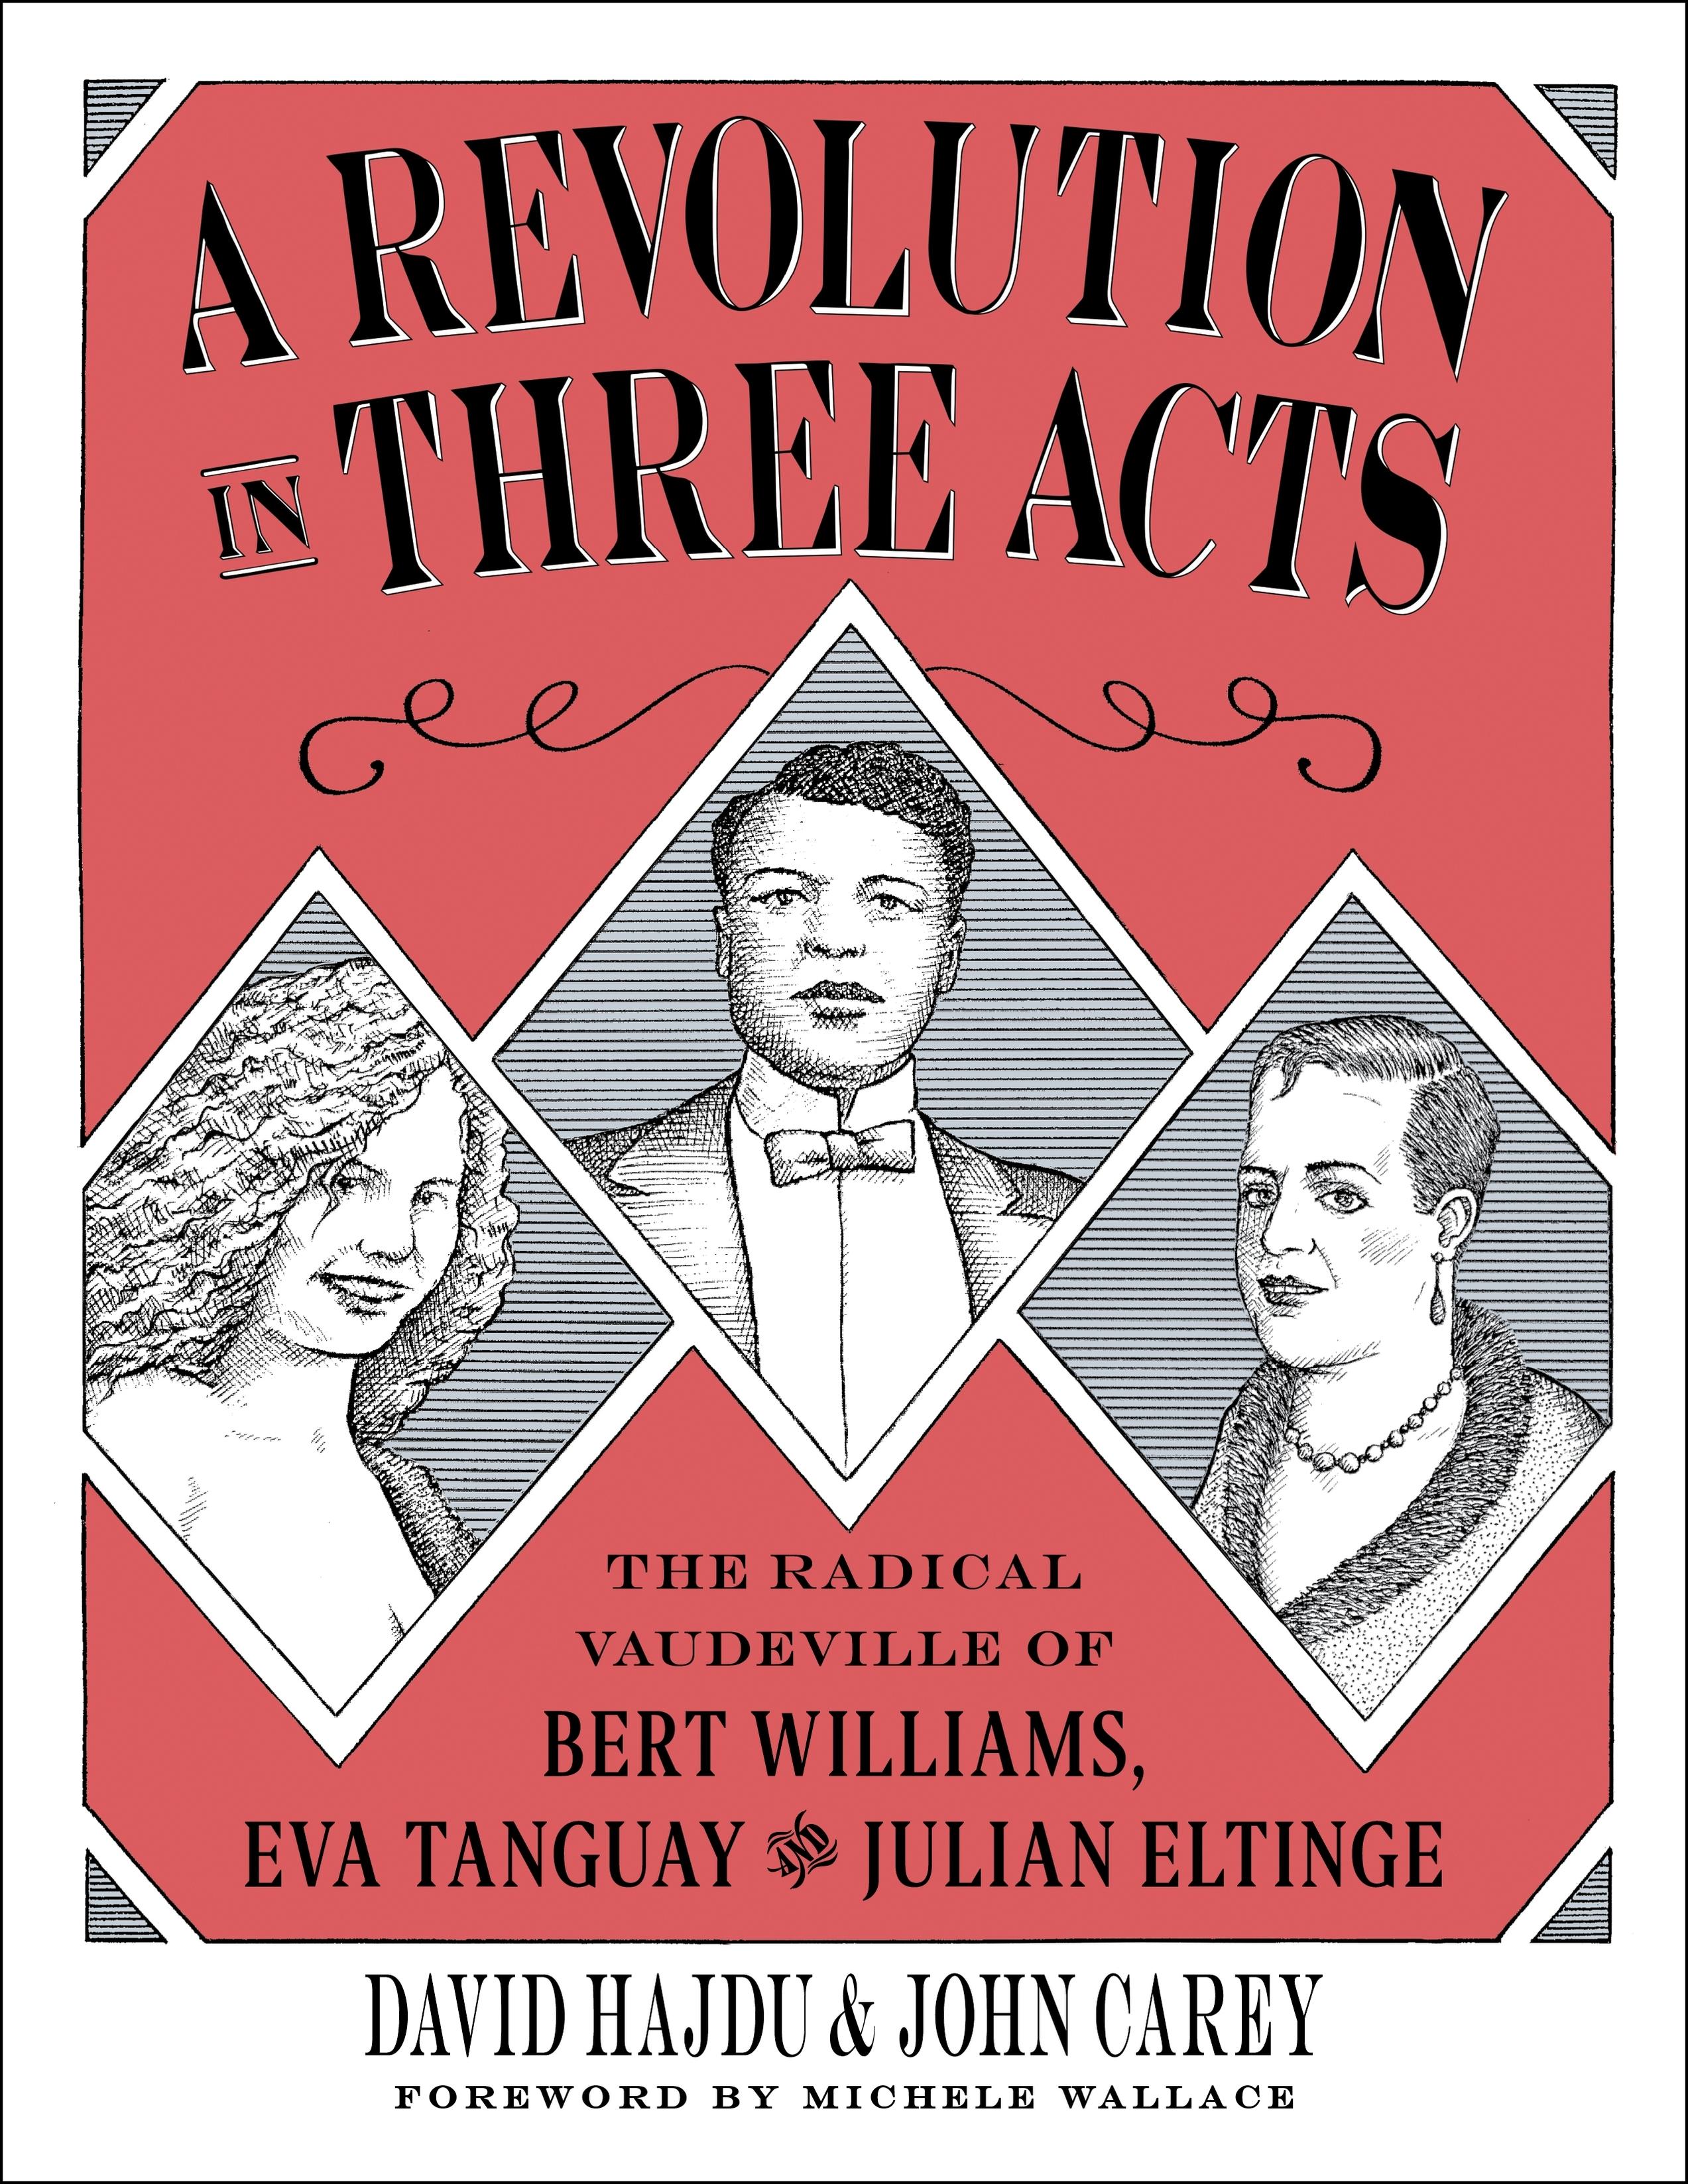 Panel Mania: A Revolution in Three Acts: The Radical Vaudeville of Bert Williams, Eva Tanguay, and Julian Eltinge